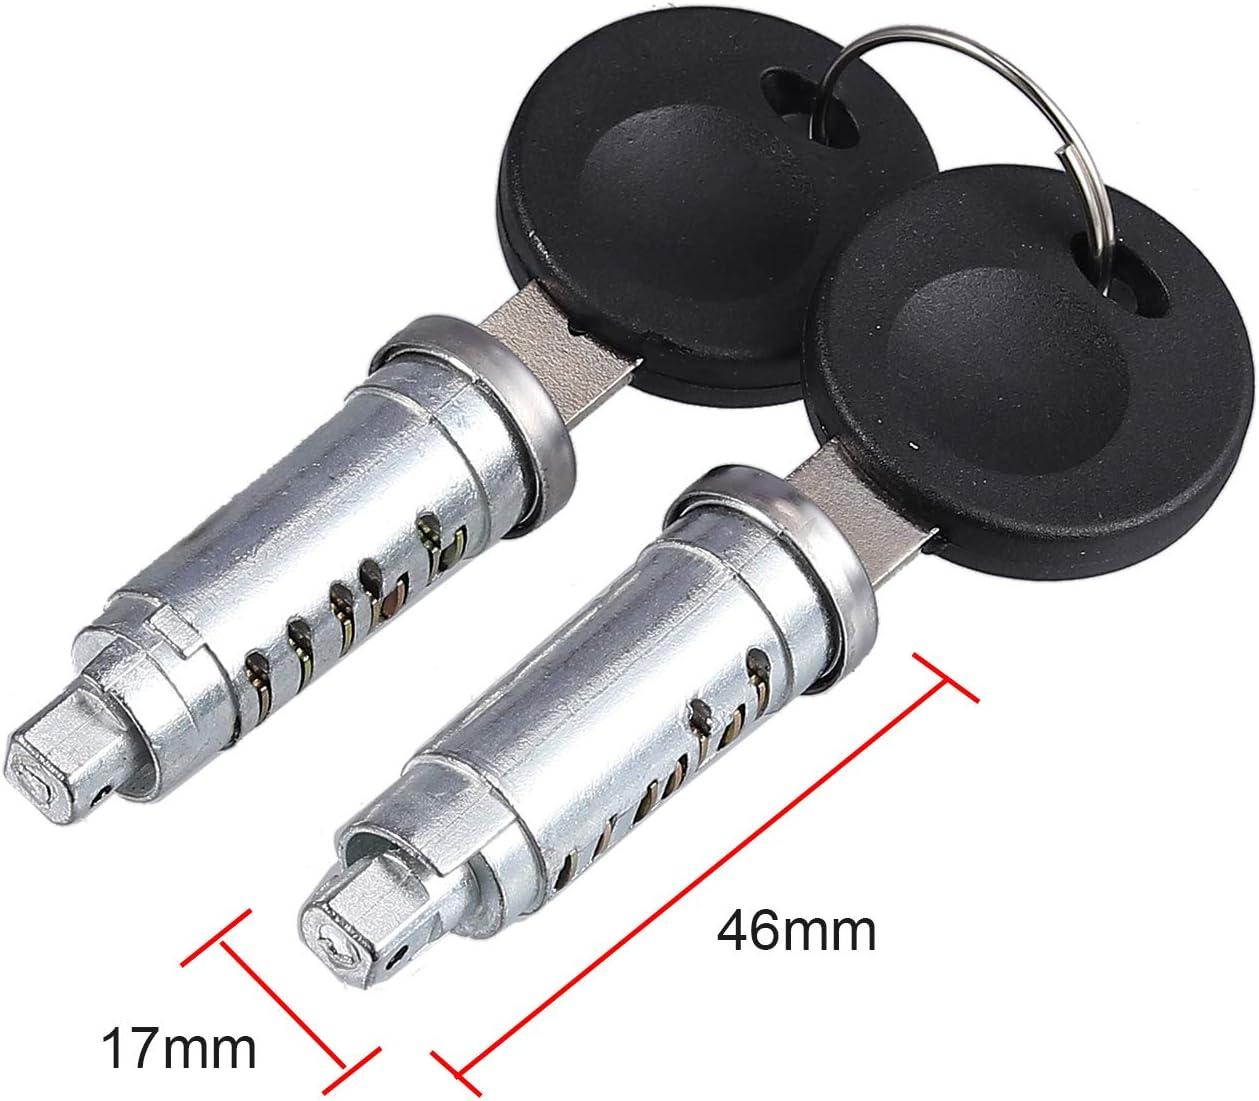 eGang/Auto New 7Pcs//Set 1 Ignition Switch 4 Door Lock Barrel W//2 Keys For T4 Caravelle MK IV 1990-2003 Transporter 701837205